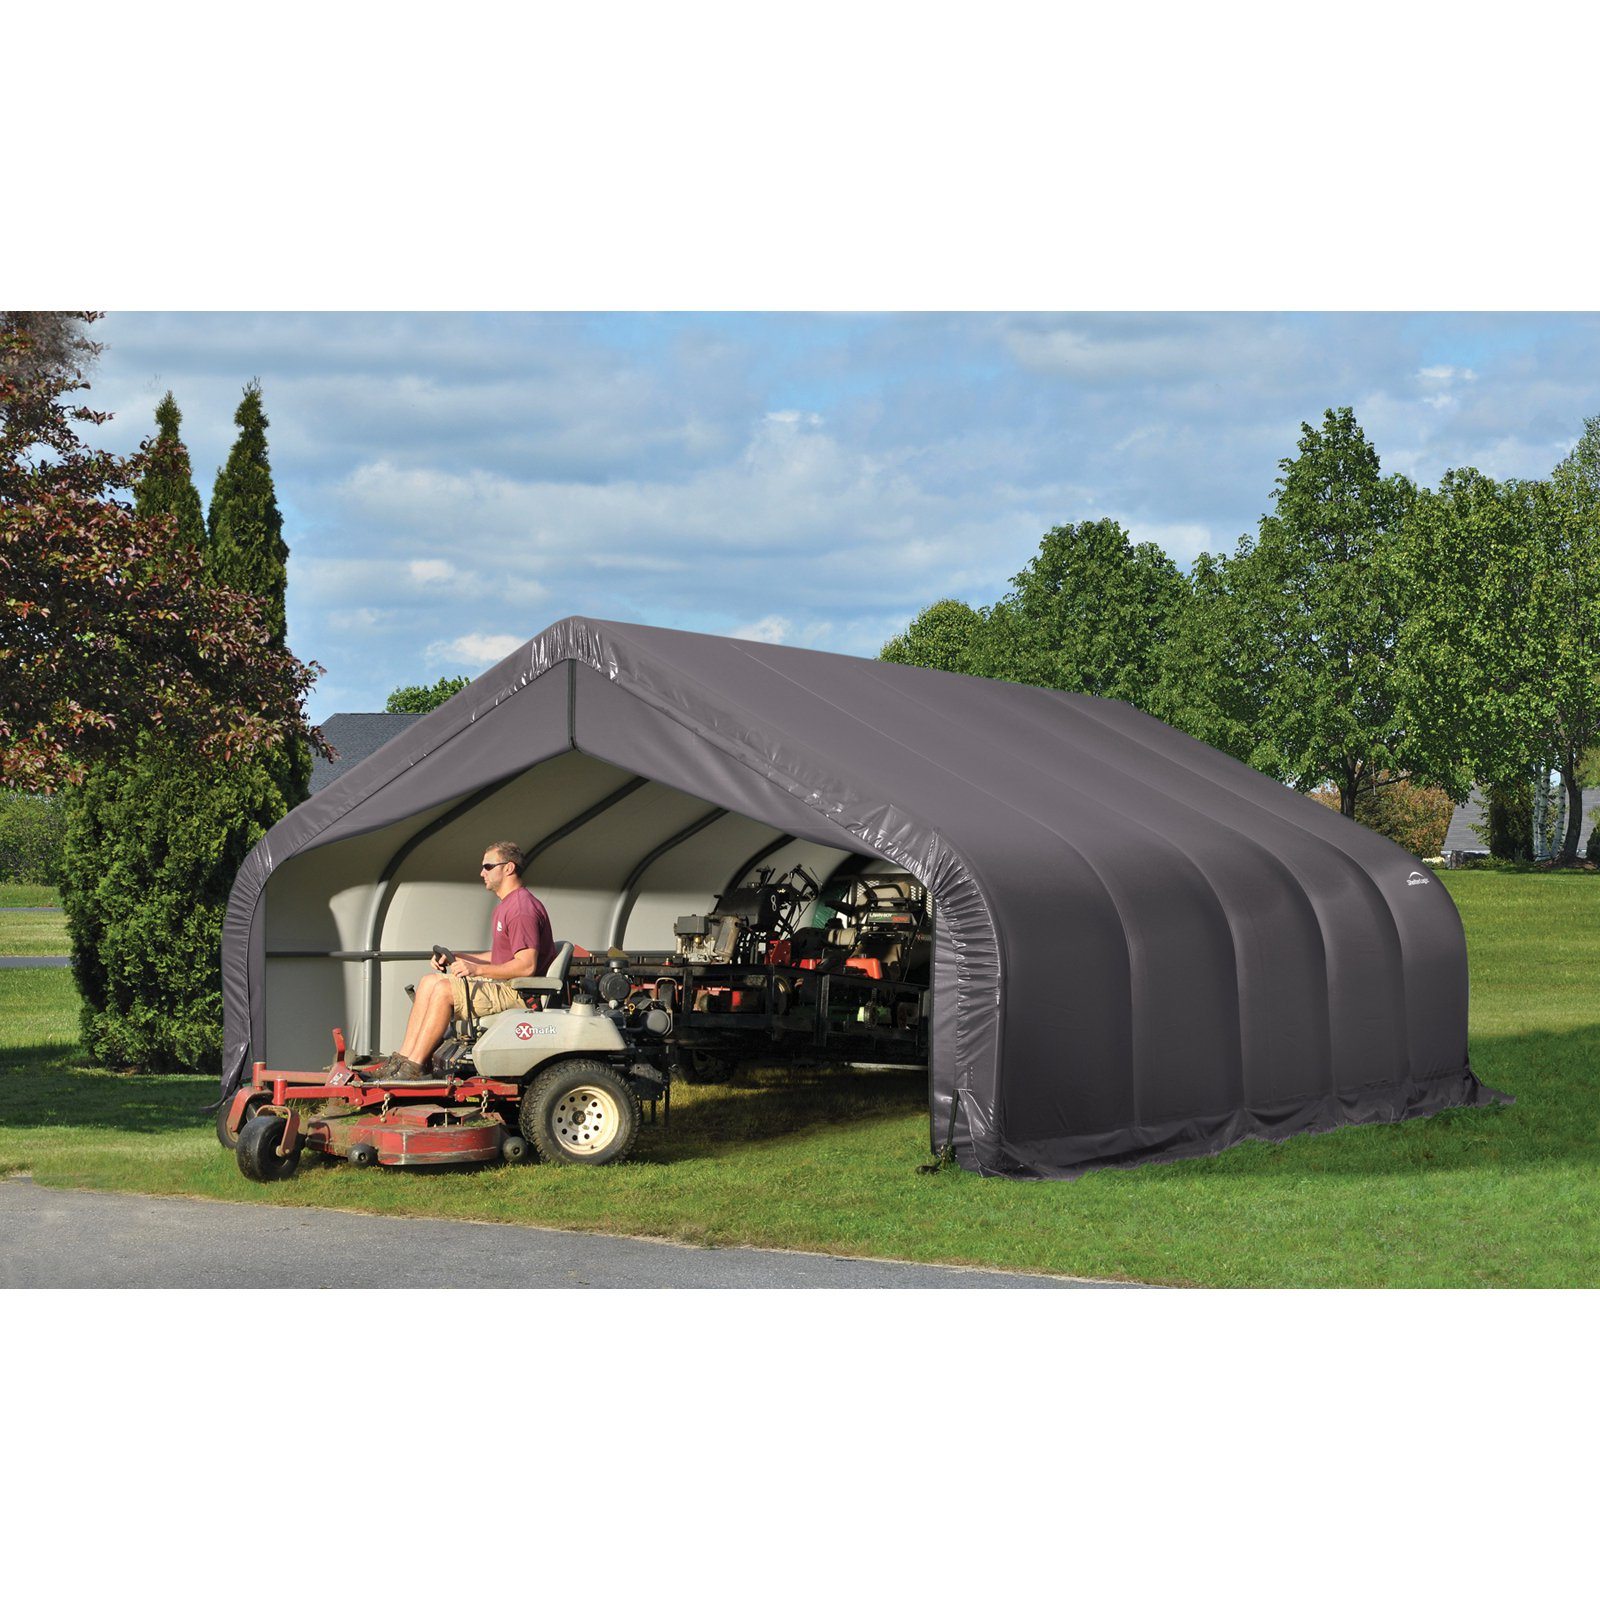 18' x 24' x 9' Peak Style Shelter, Gray